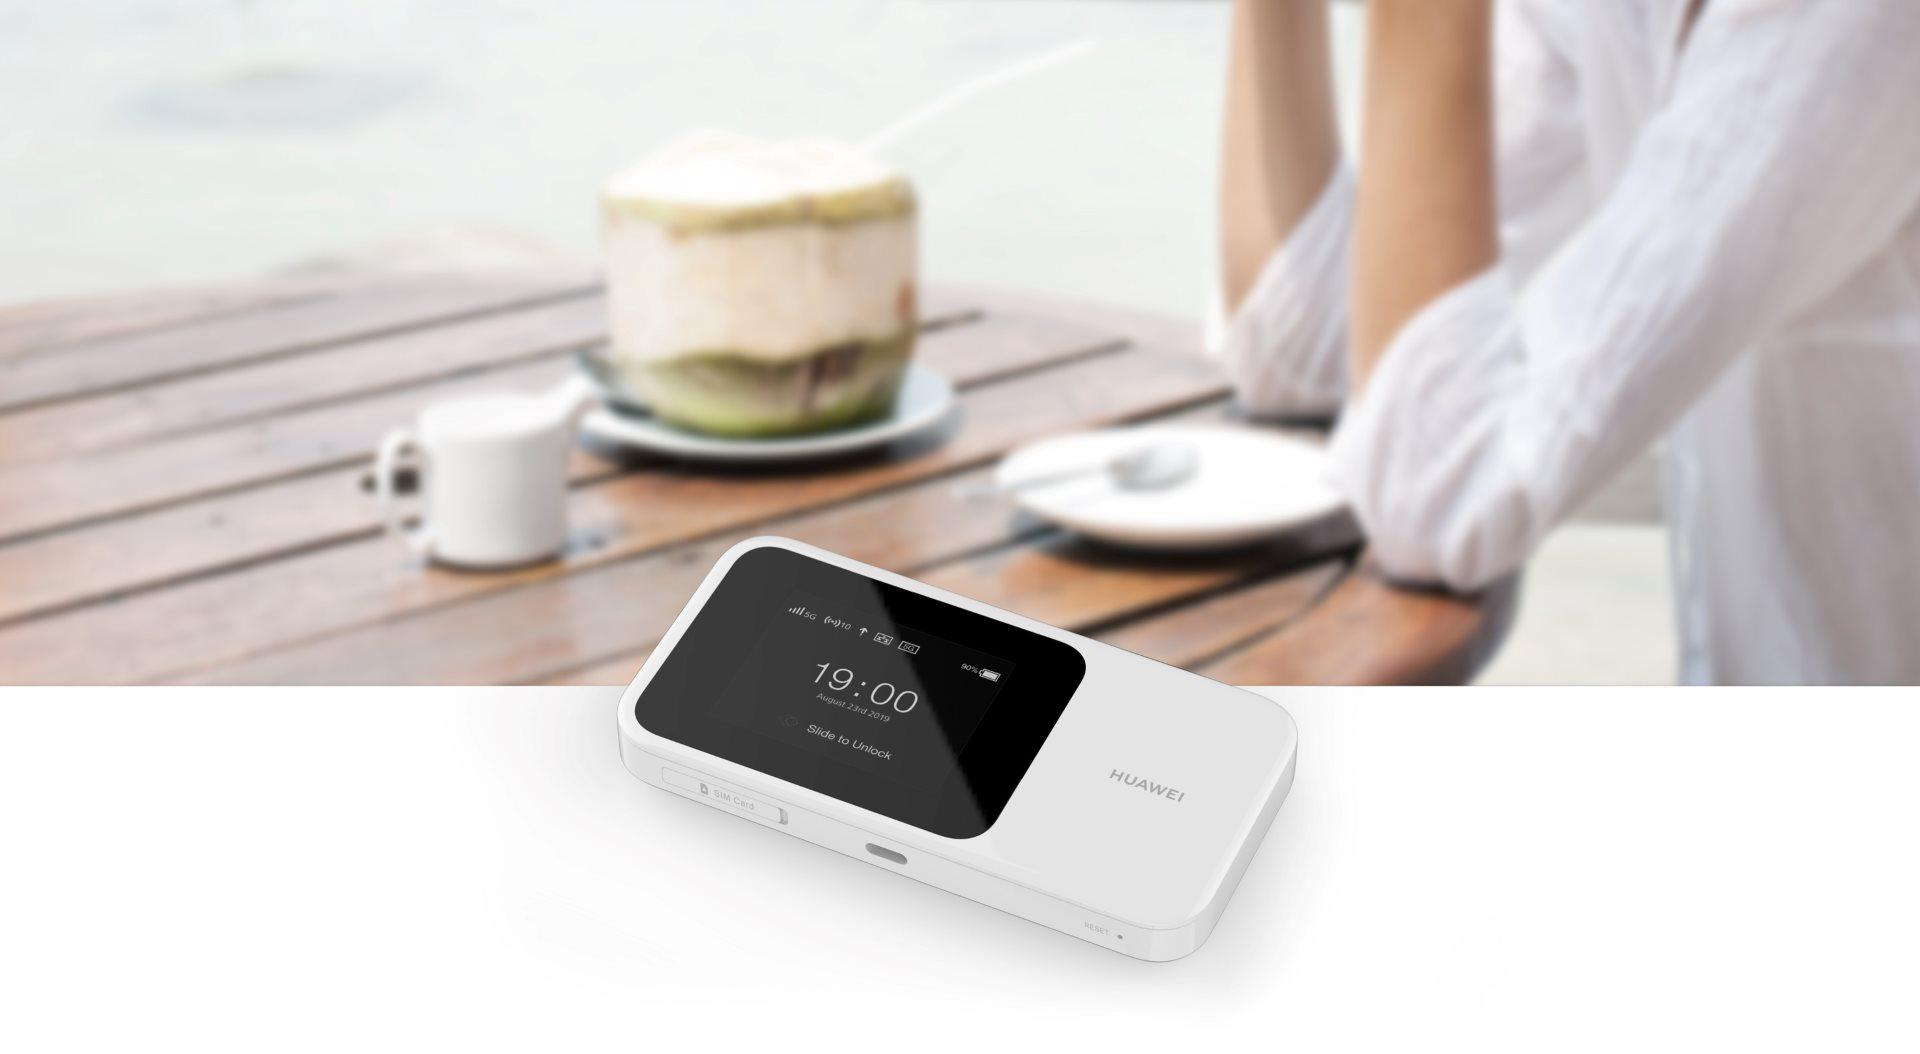 HUAWEI представляет роутер 5G CPE Pro на MWC 2019 - 5G MiFi